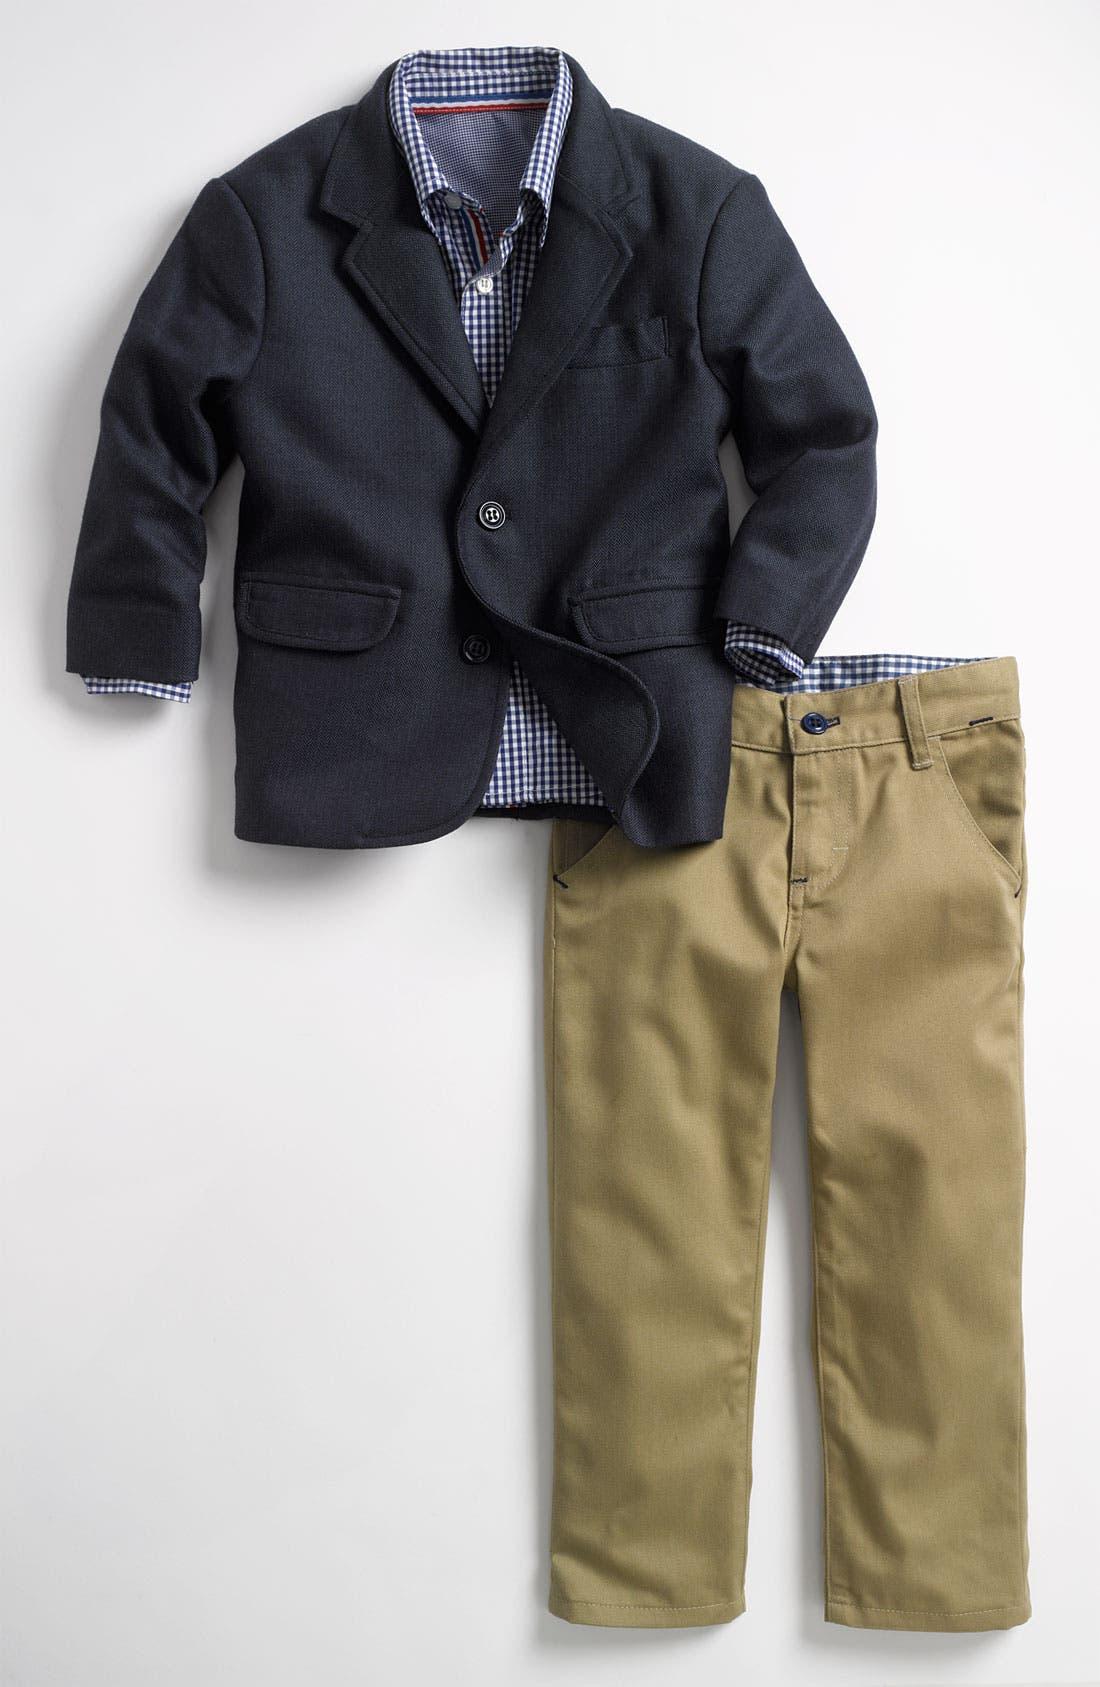 Alternate Image 1 Selected - Sovereign Code 'United' Blazer, Shirt & Pants Set (Toddler)